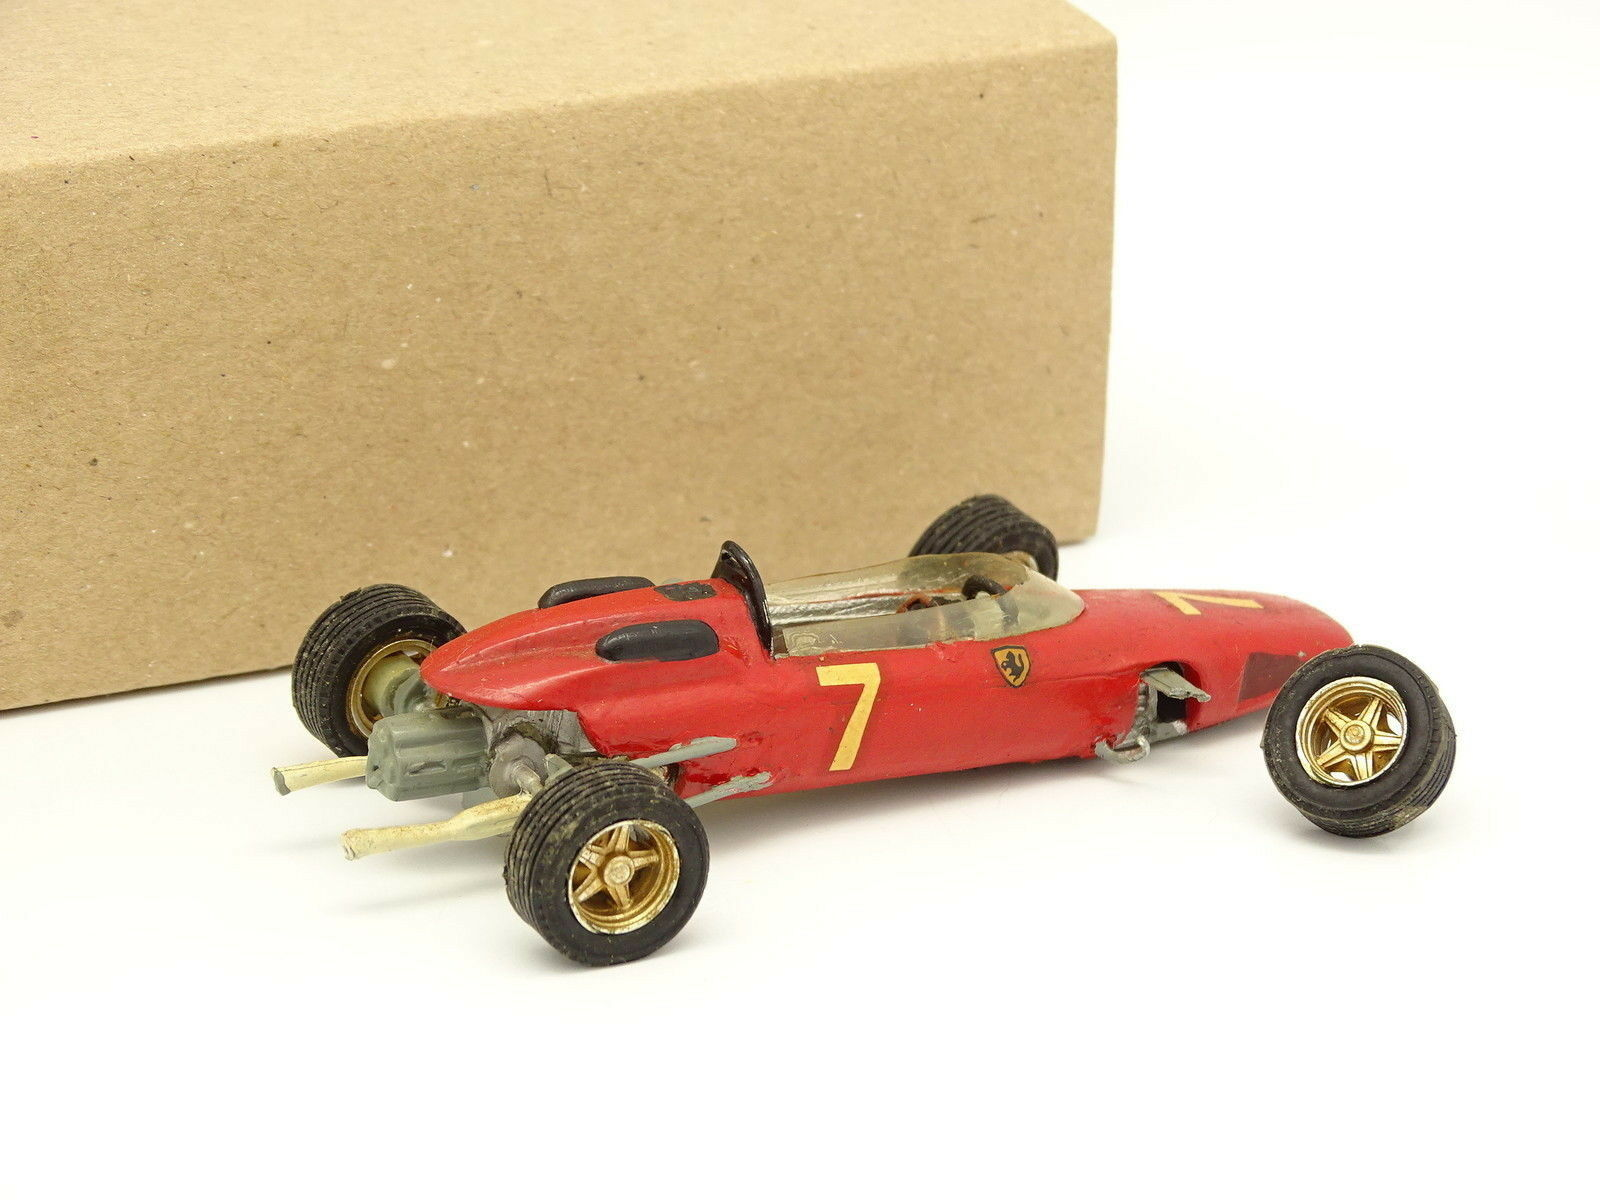 John Day Set Metall Aufgebaut Aufgebaut Aufgebaut 1 43 - Ferrari 158 F1 069936